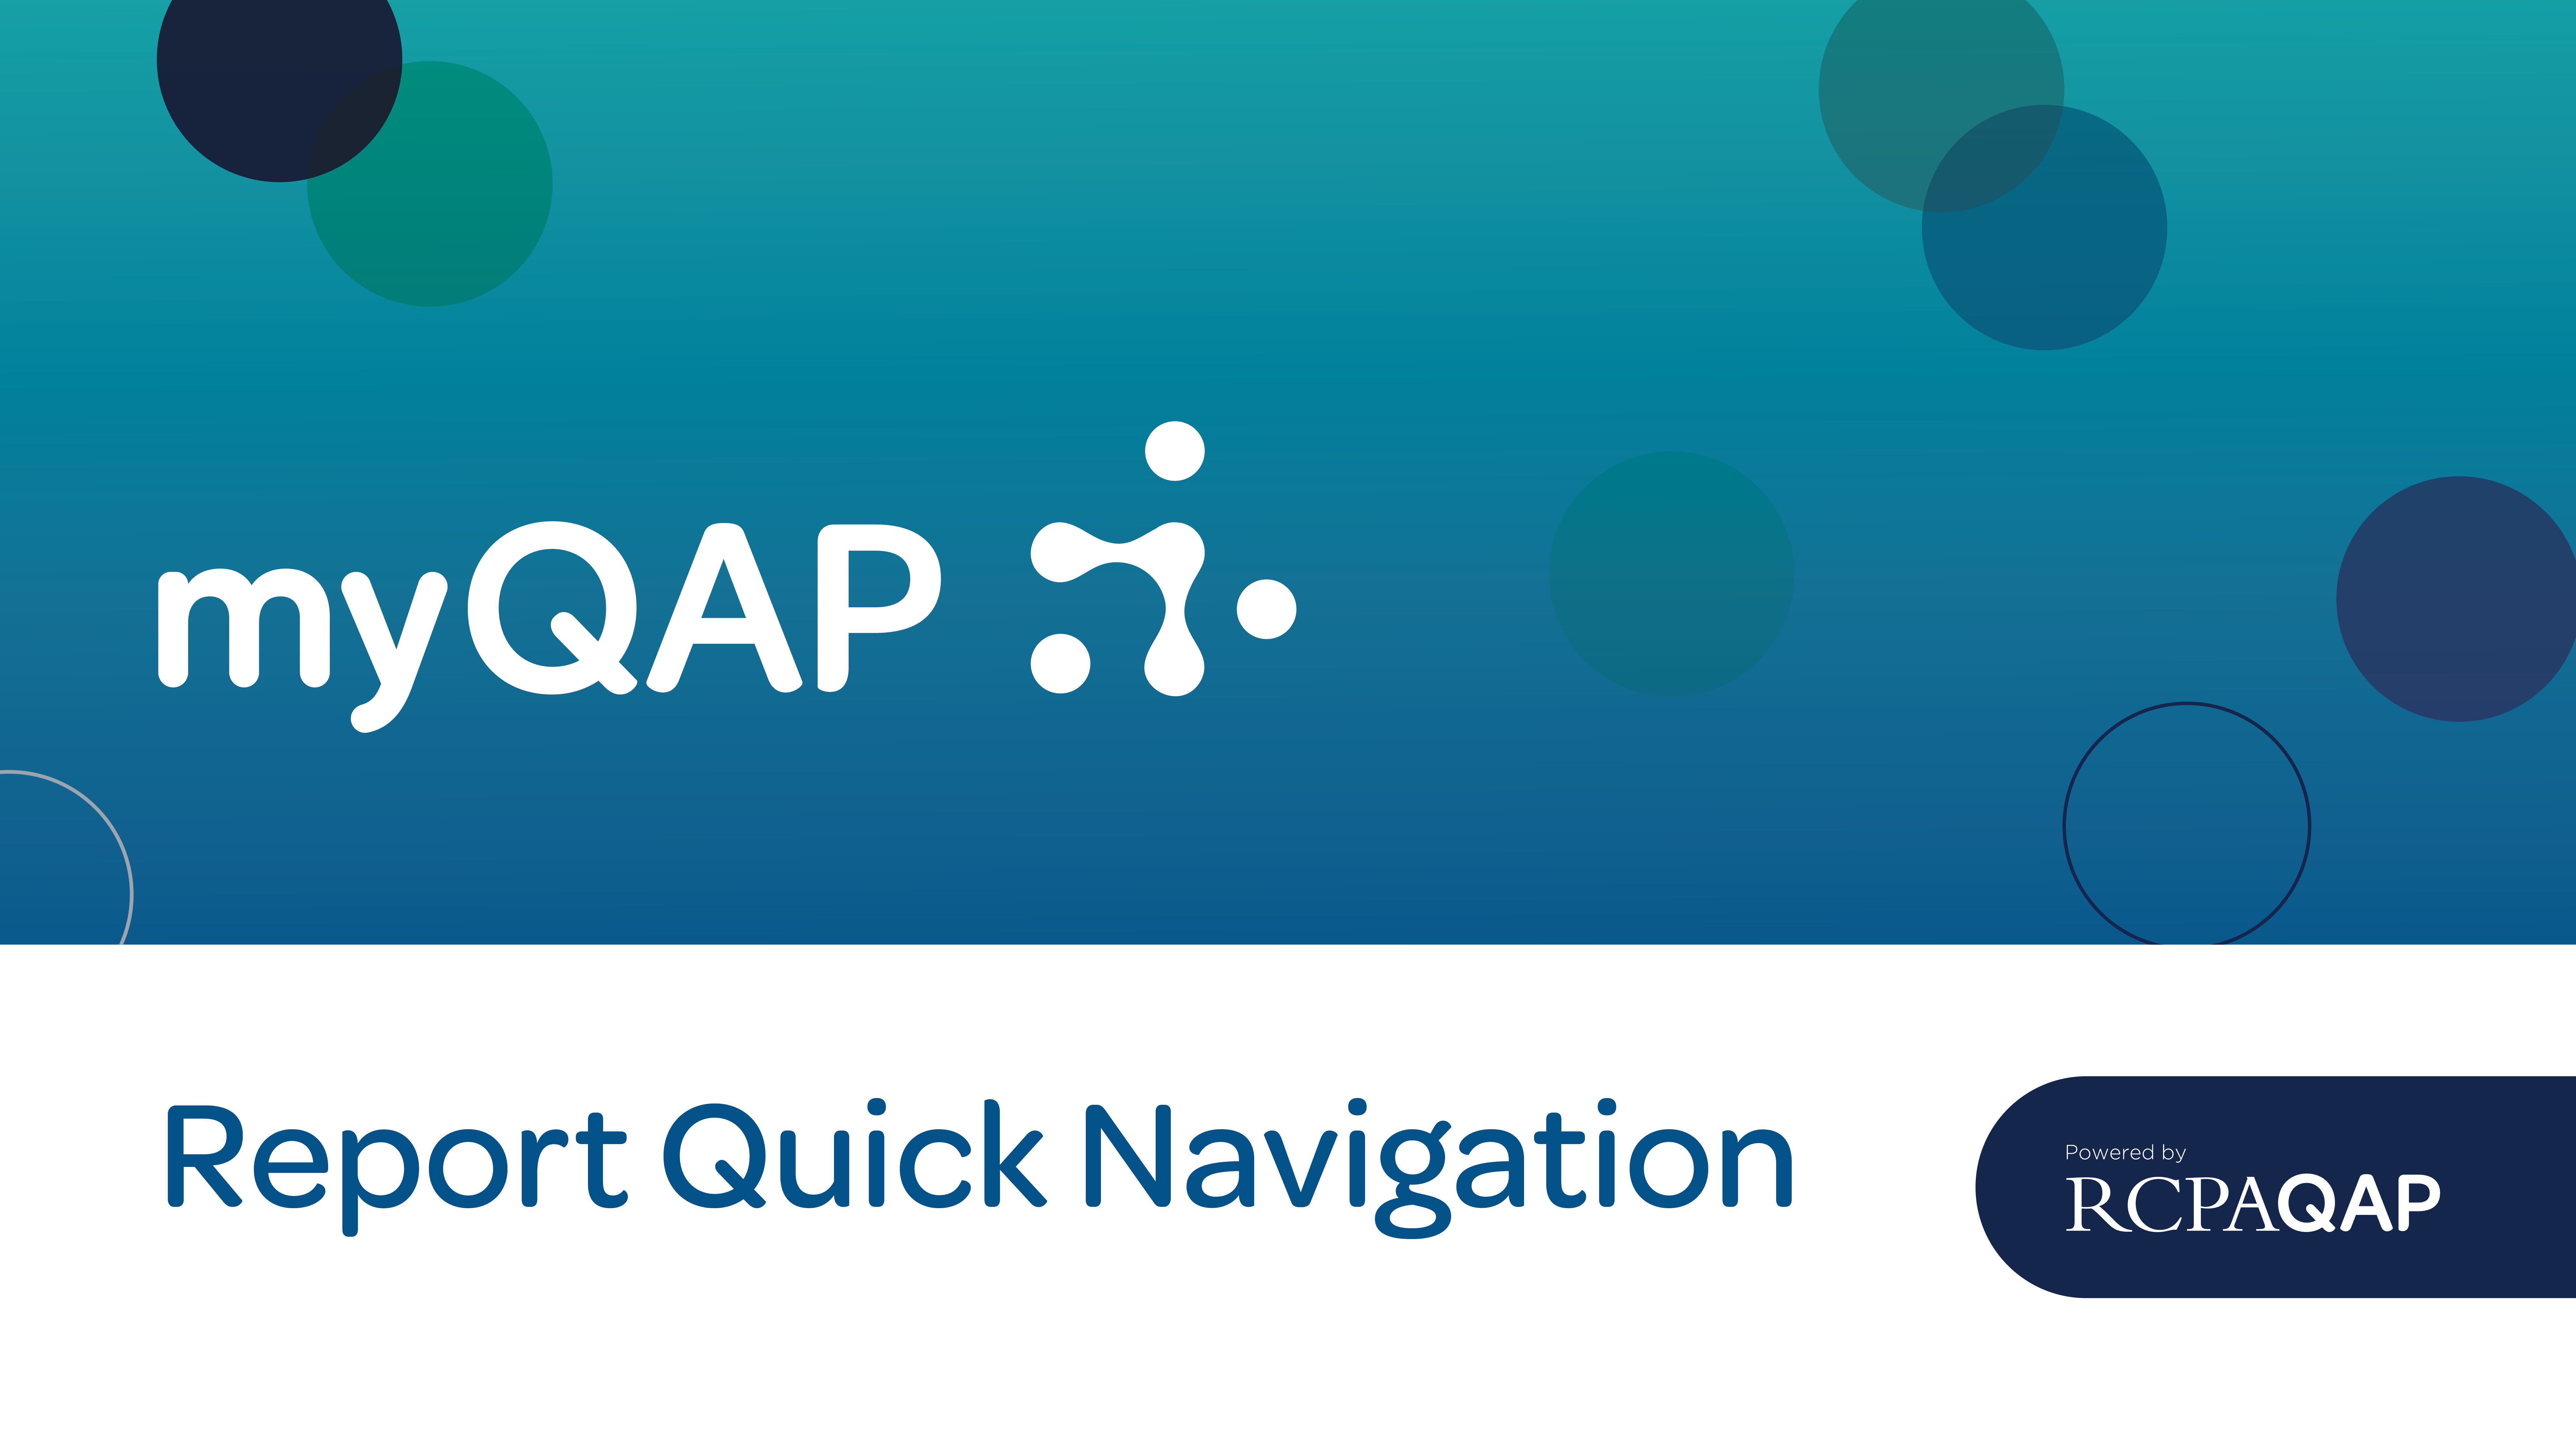 Report Quick Navigation